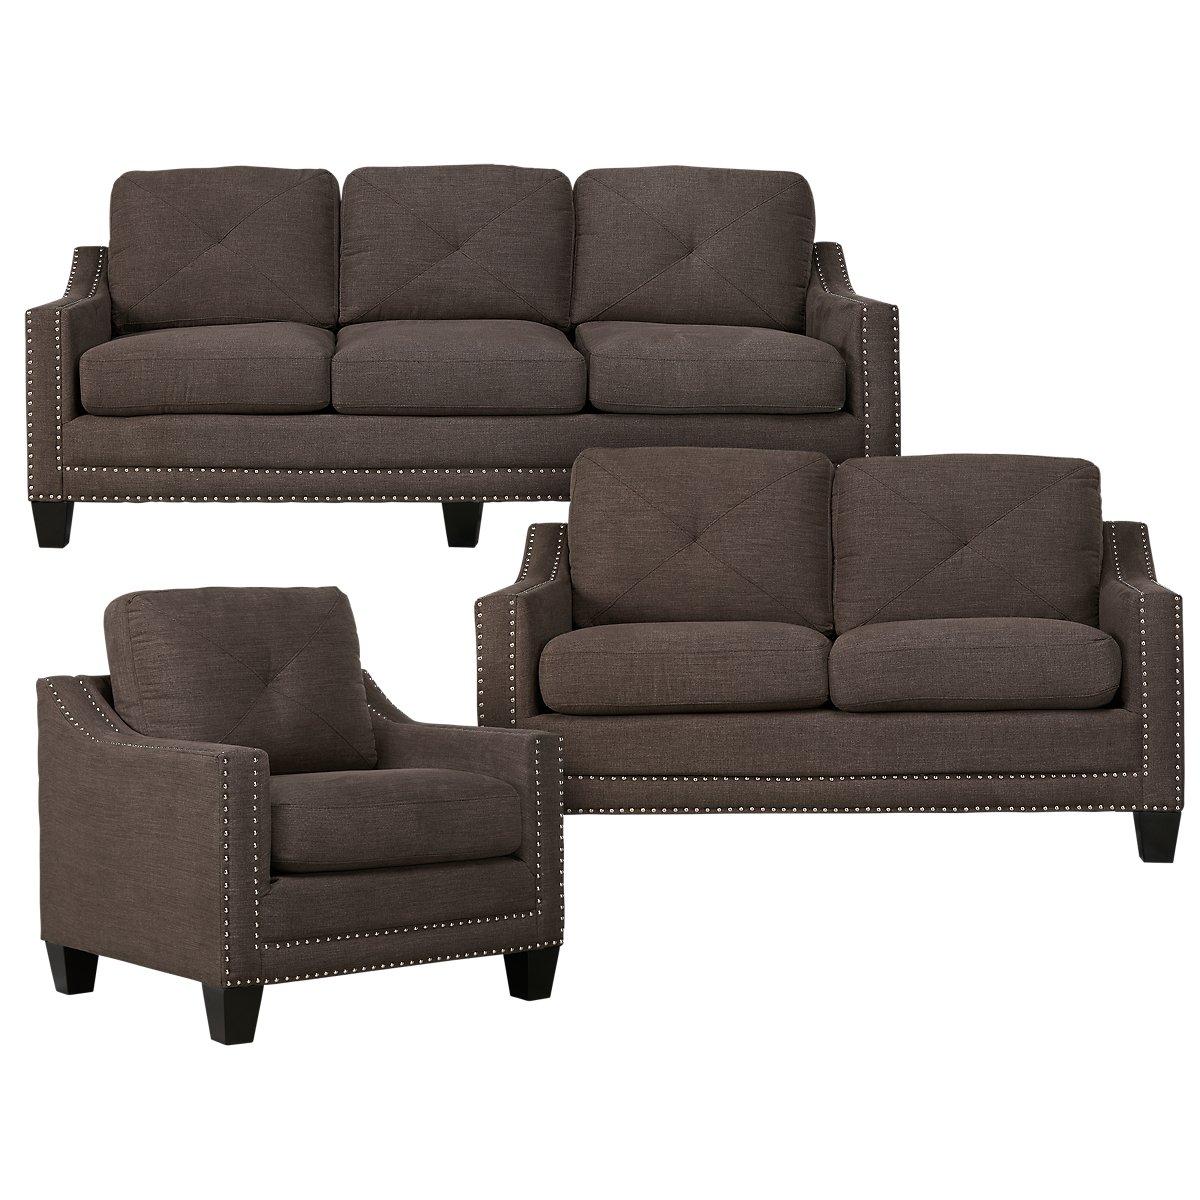 City Furniture: Malone Dark Gray Microfiber Chair